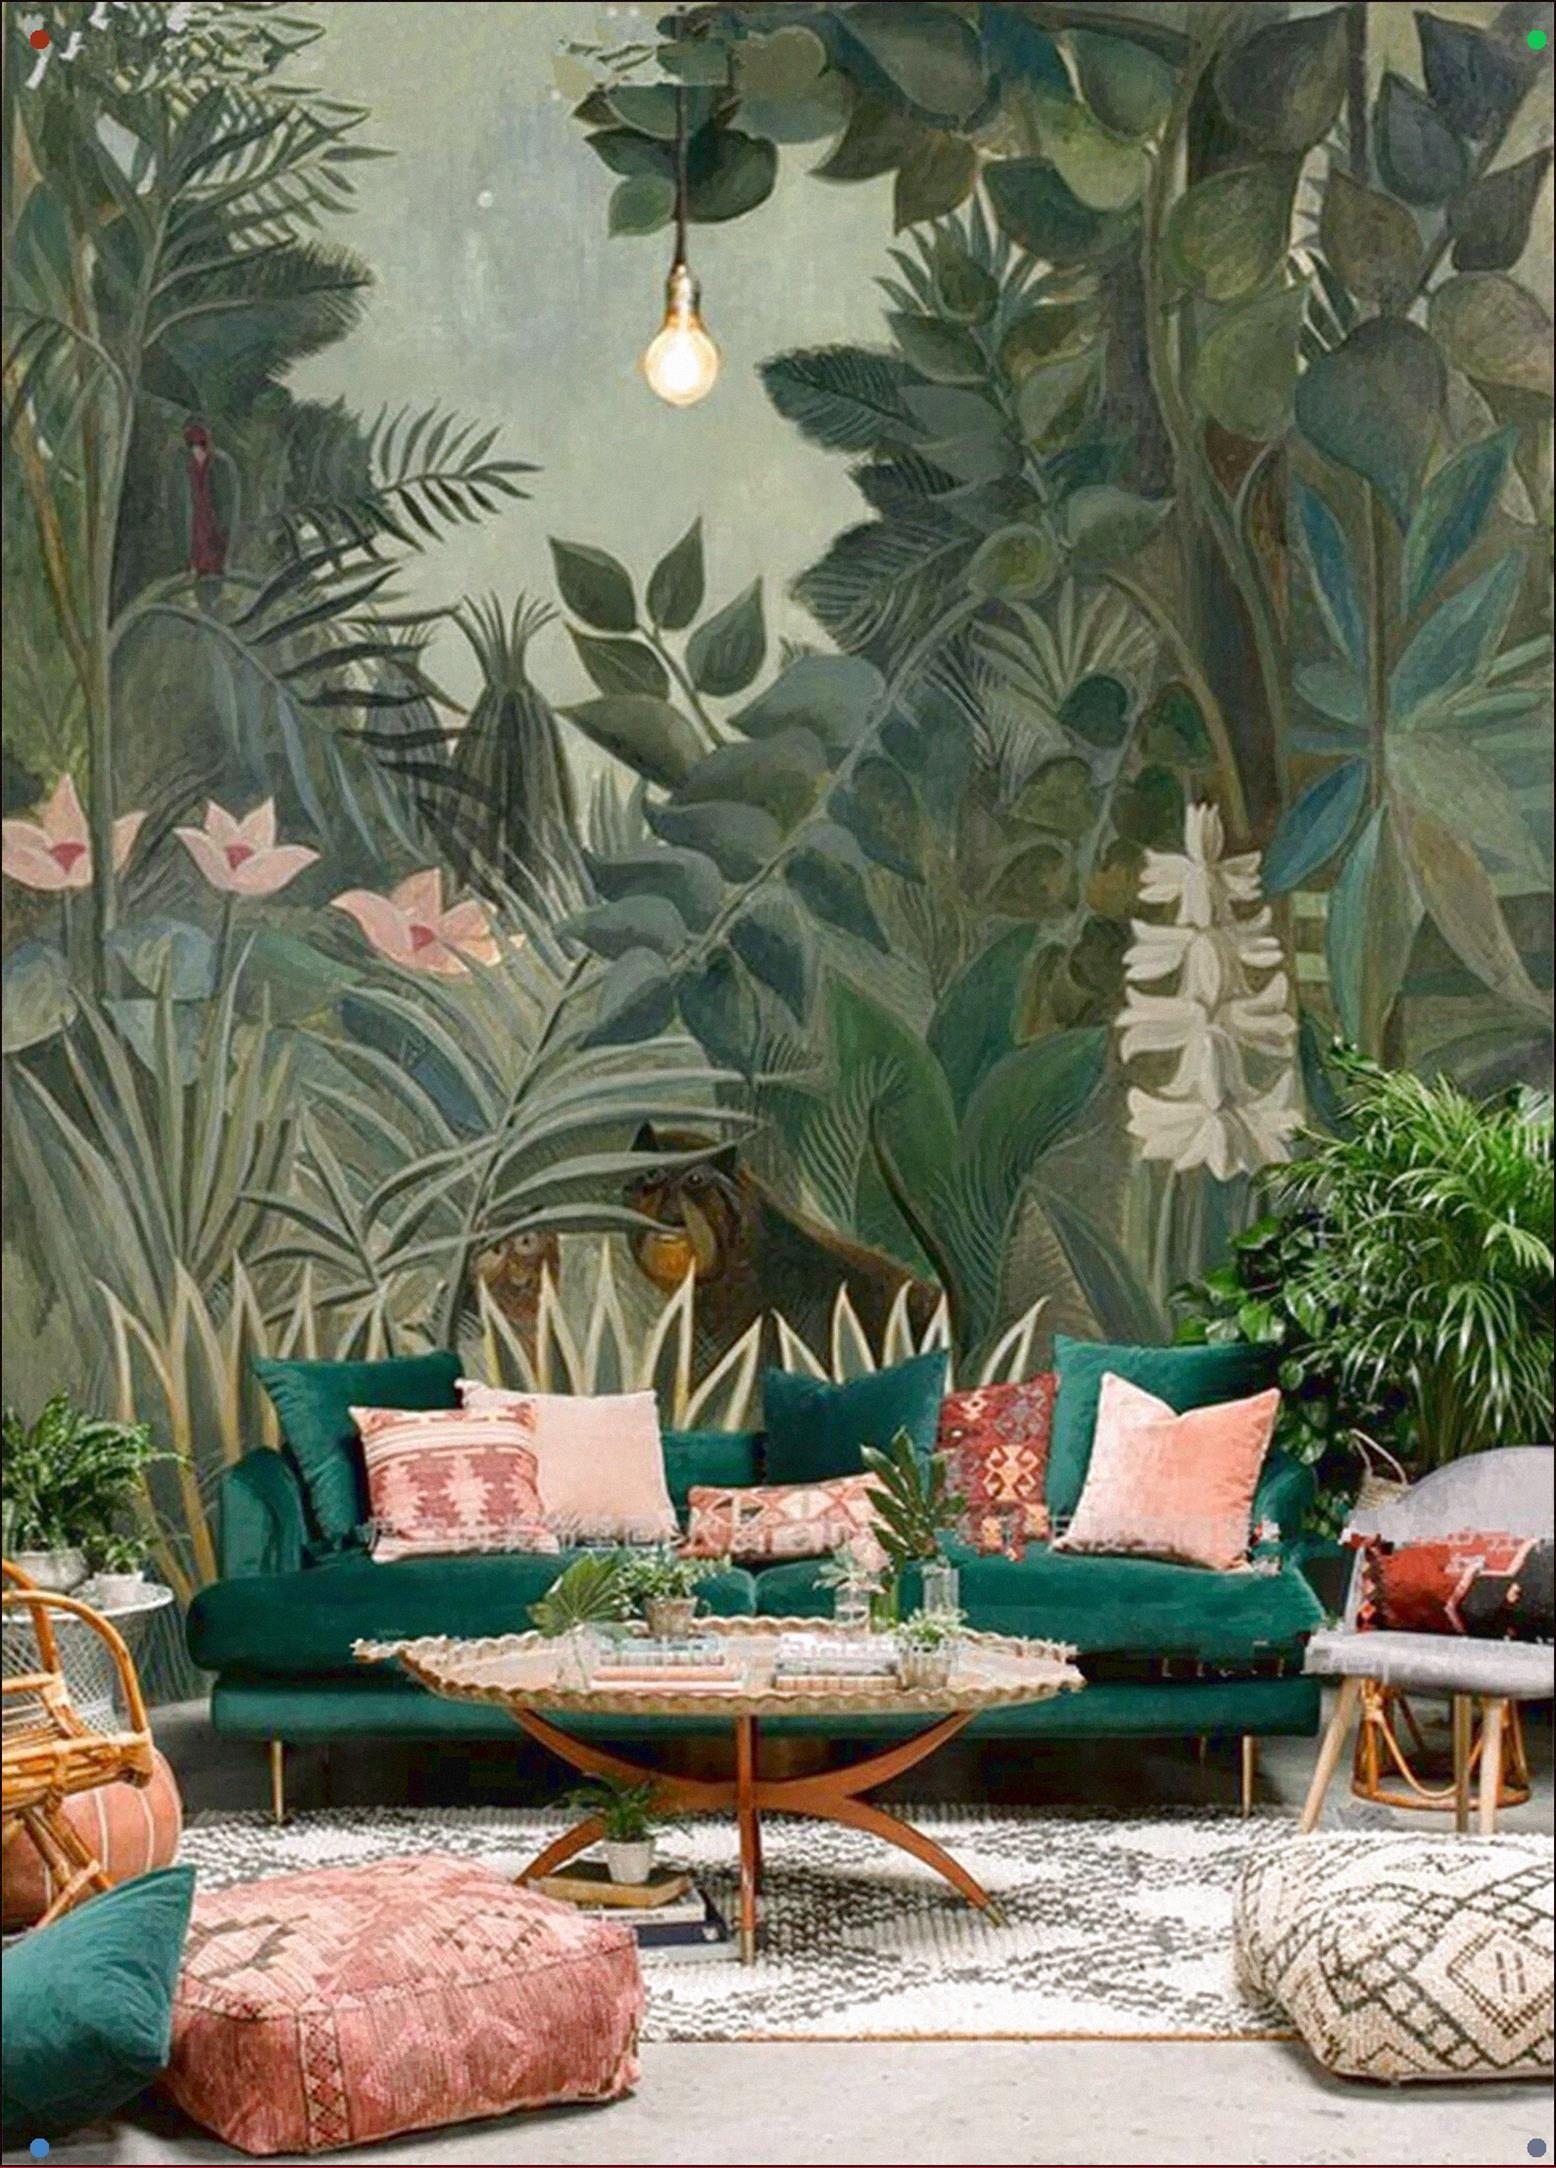 Tree Design Wallpaper Living Room: Oil Painting Jungle Forest Trees Wallpaper Wall Mural Dark